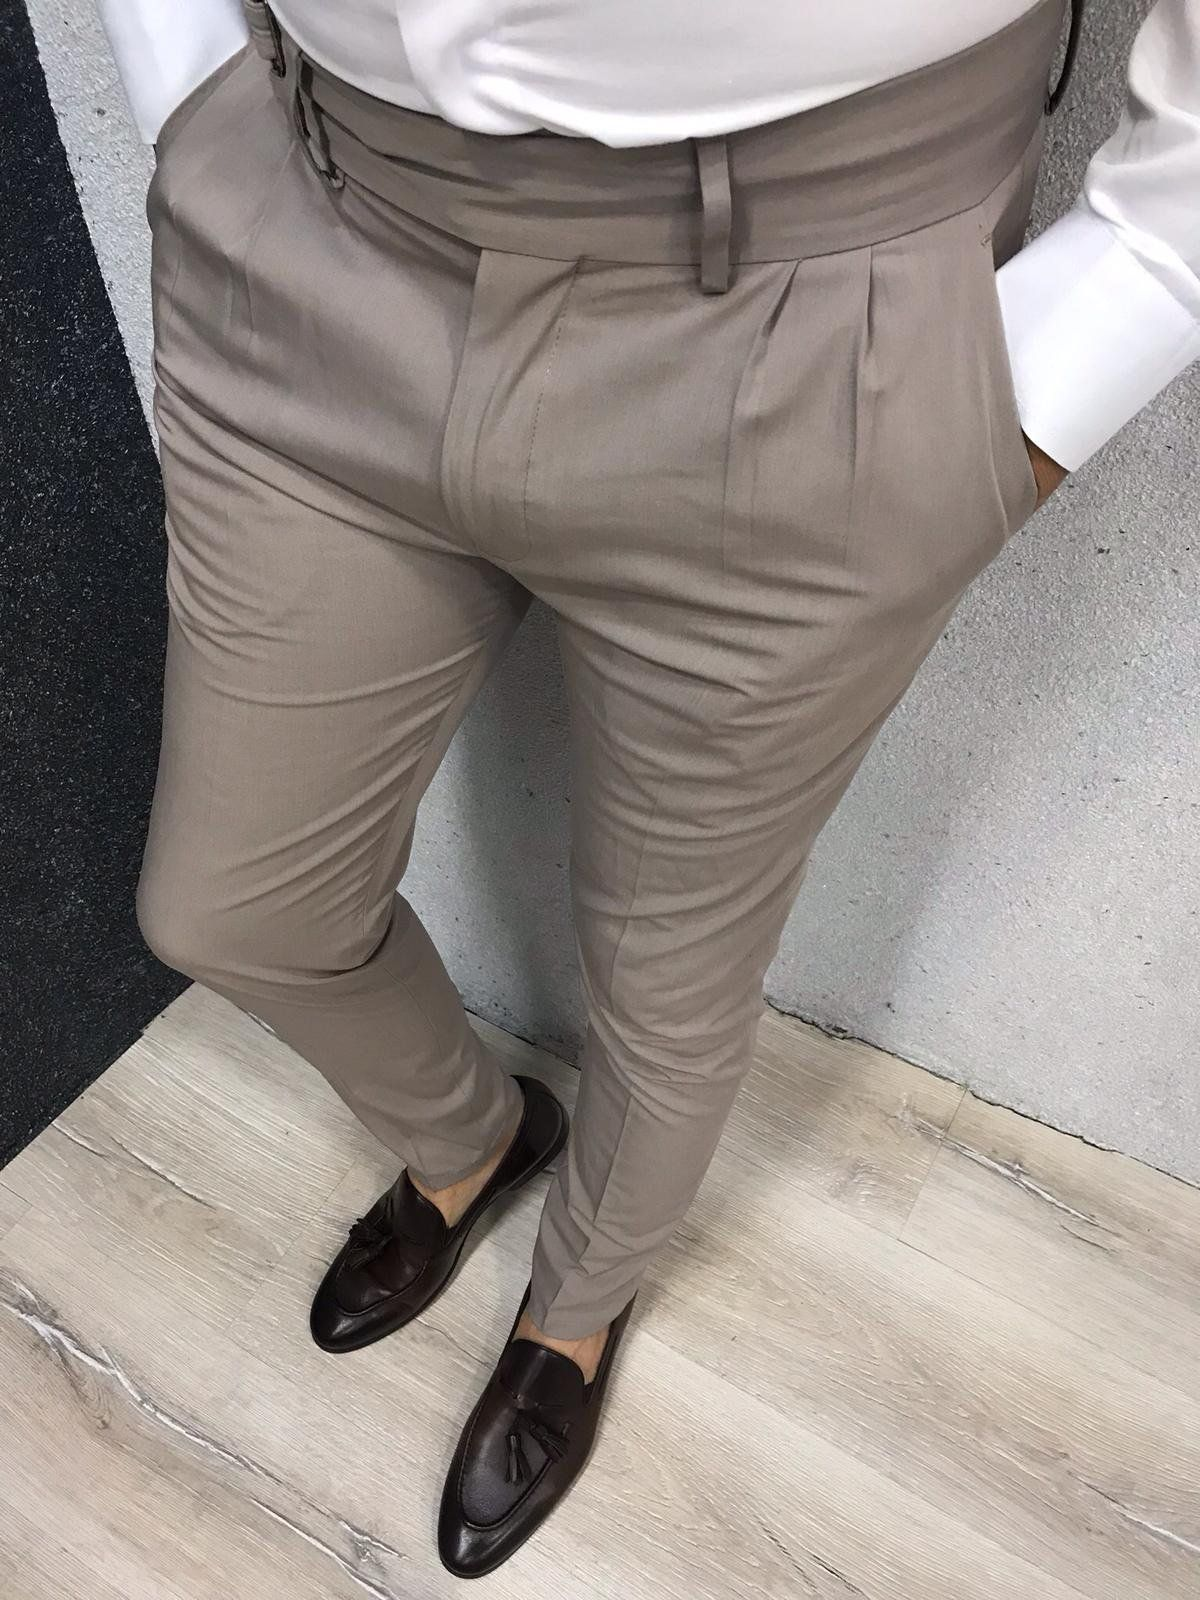 Kingston Cream Corset Belted Pleated Pants Slim Fit Dress Pants Mens Pleated Pants Pants Outfit Men [ 1600 x 1200 Pixel ]